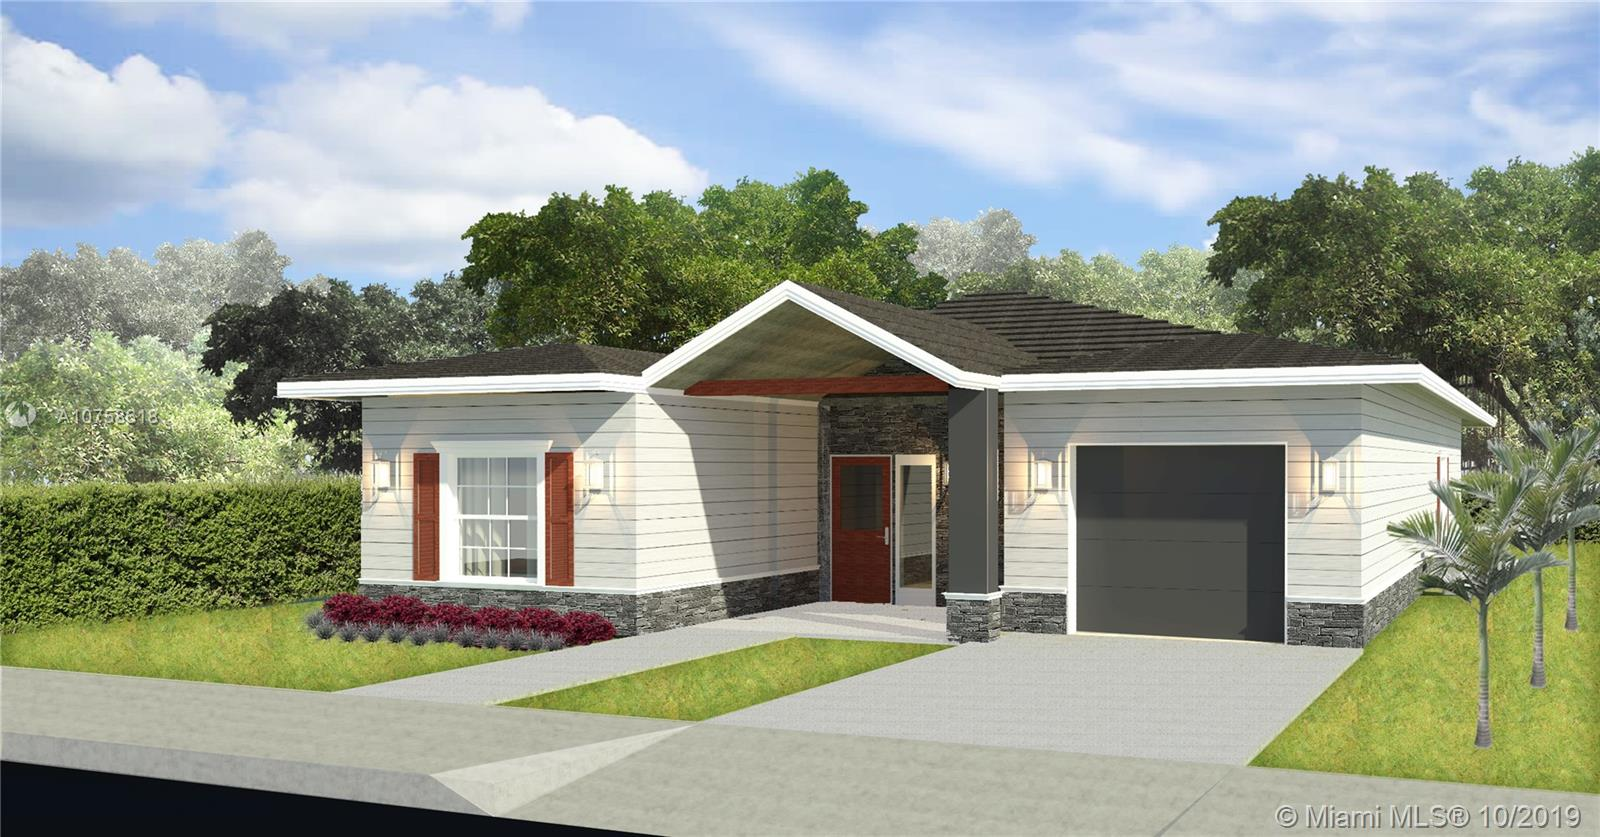 29904 SW 157 pl, Homestead, FL 33033 - Homestead, FL real estate listing